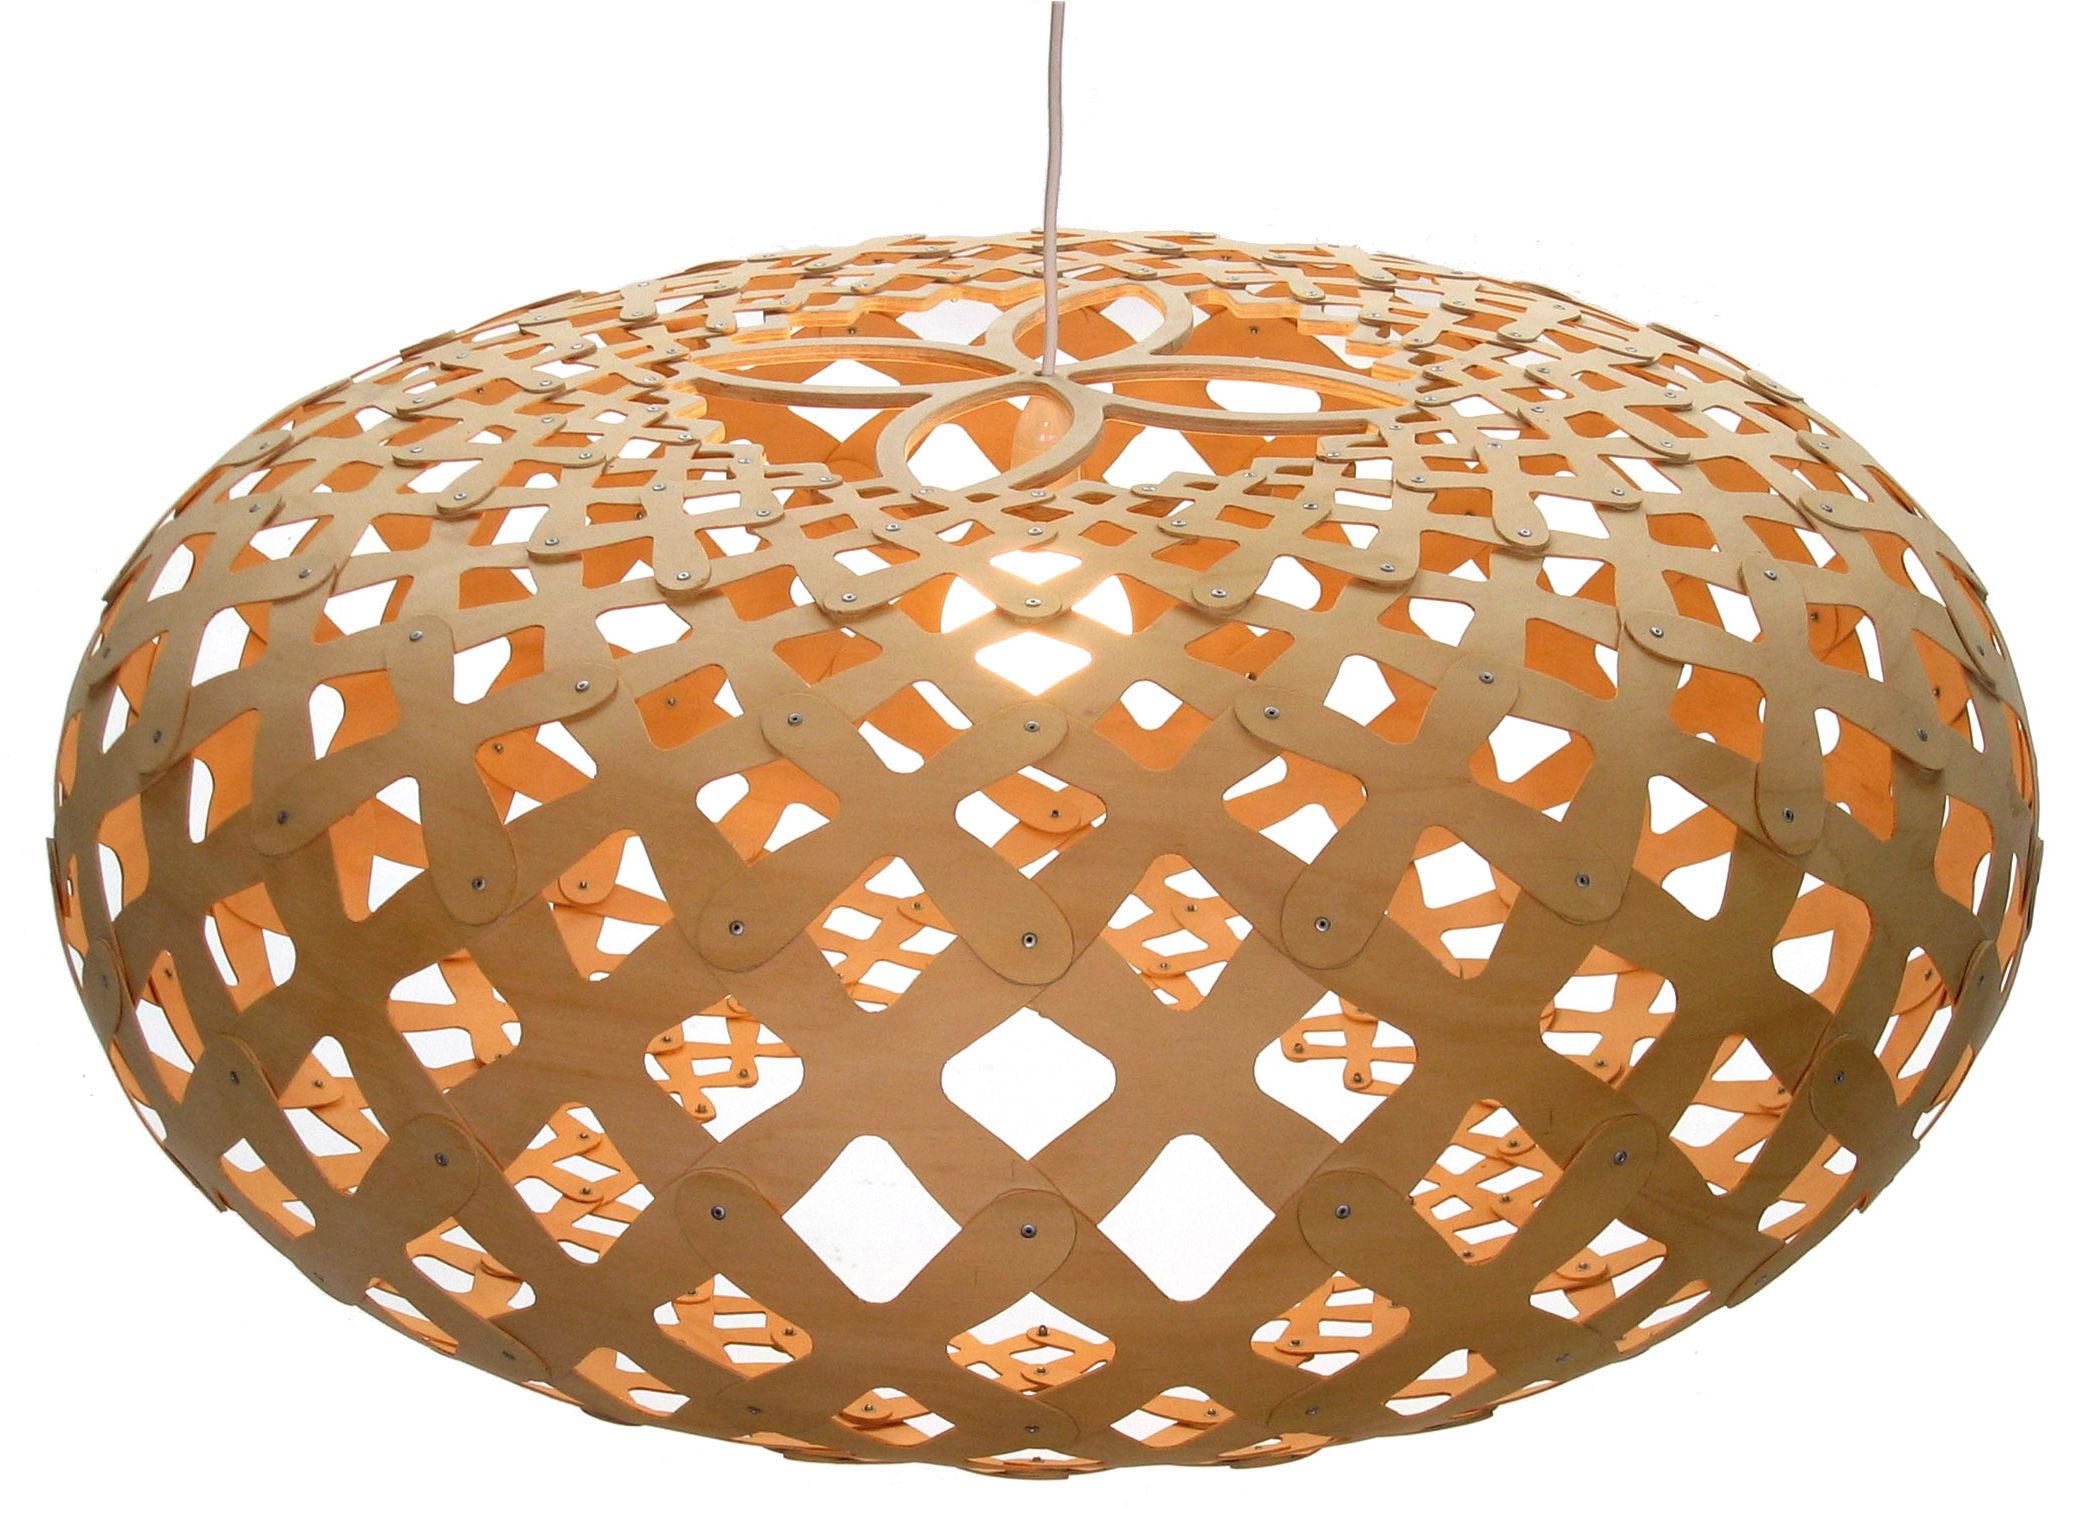 Lighting - Pendant Lighting - Kina Pendant - Ø 80 cm by David Trubridge - Natural wood - Ø 80 cm - Pine plywood